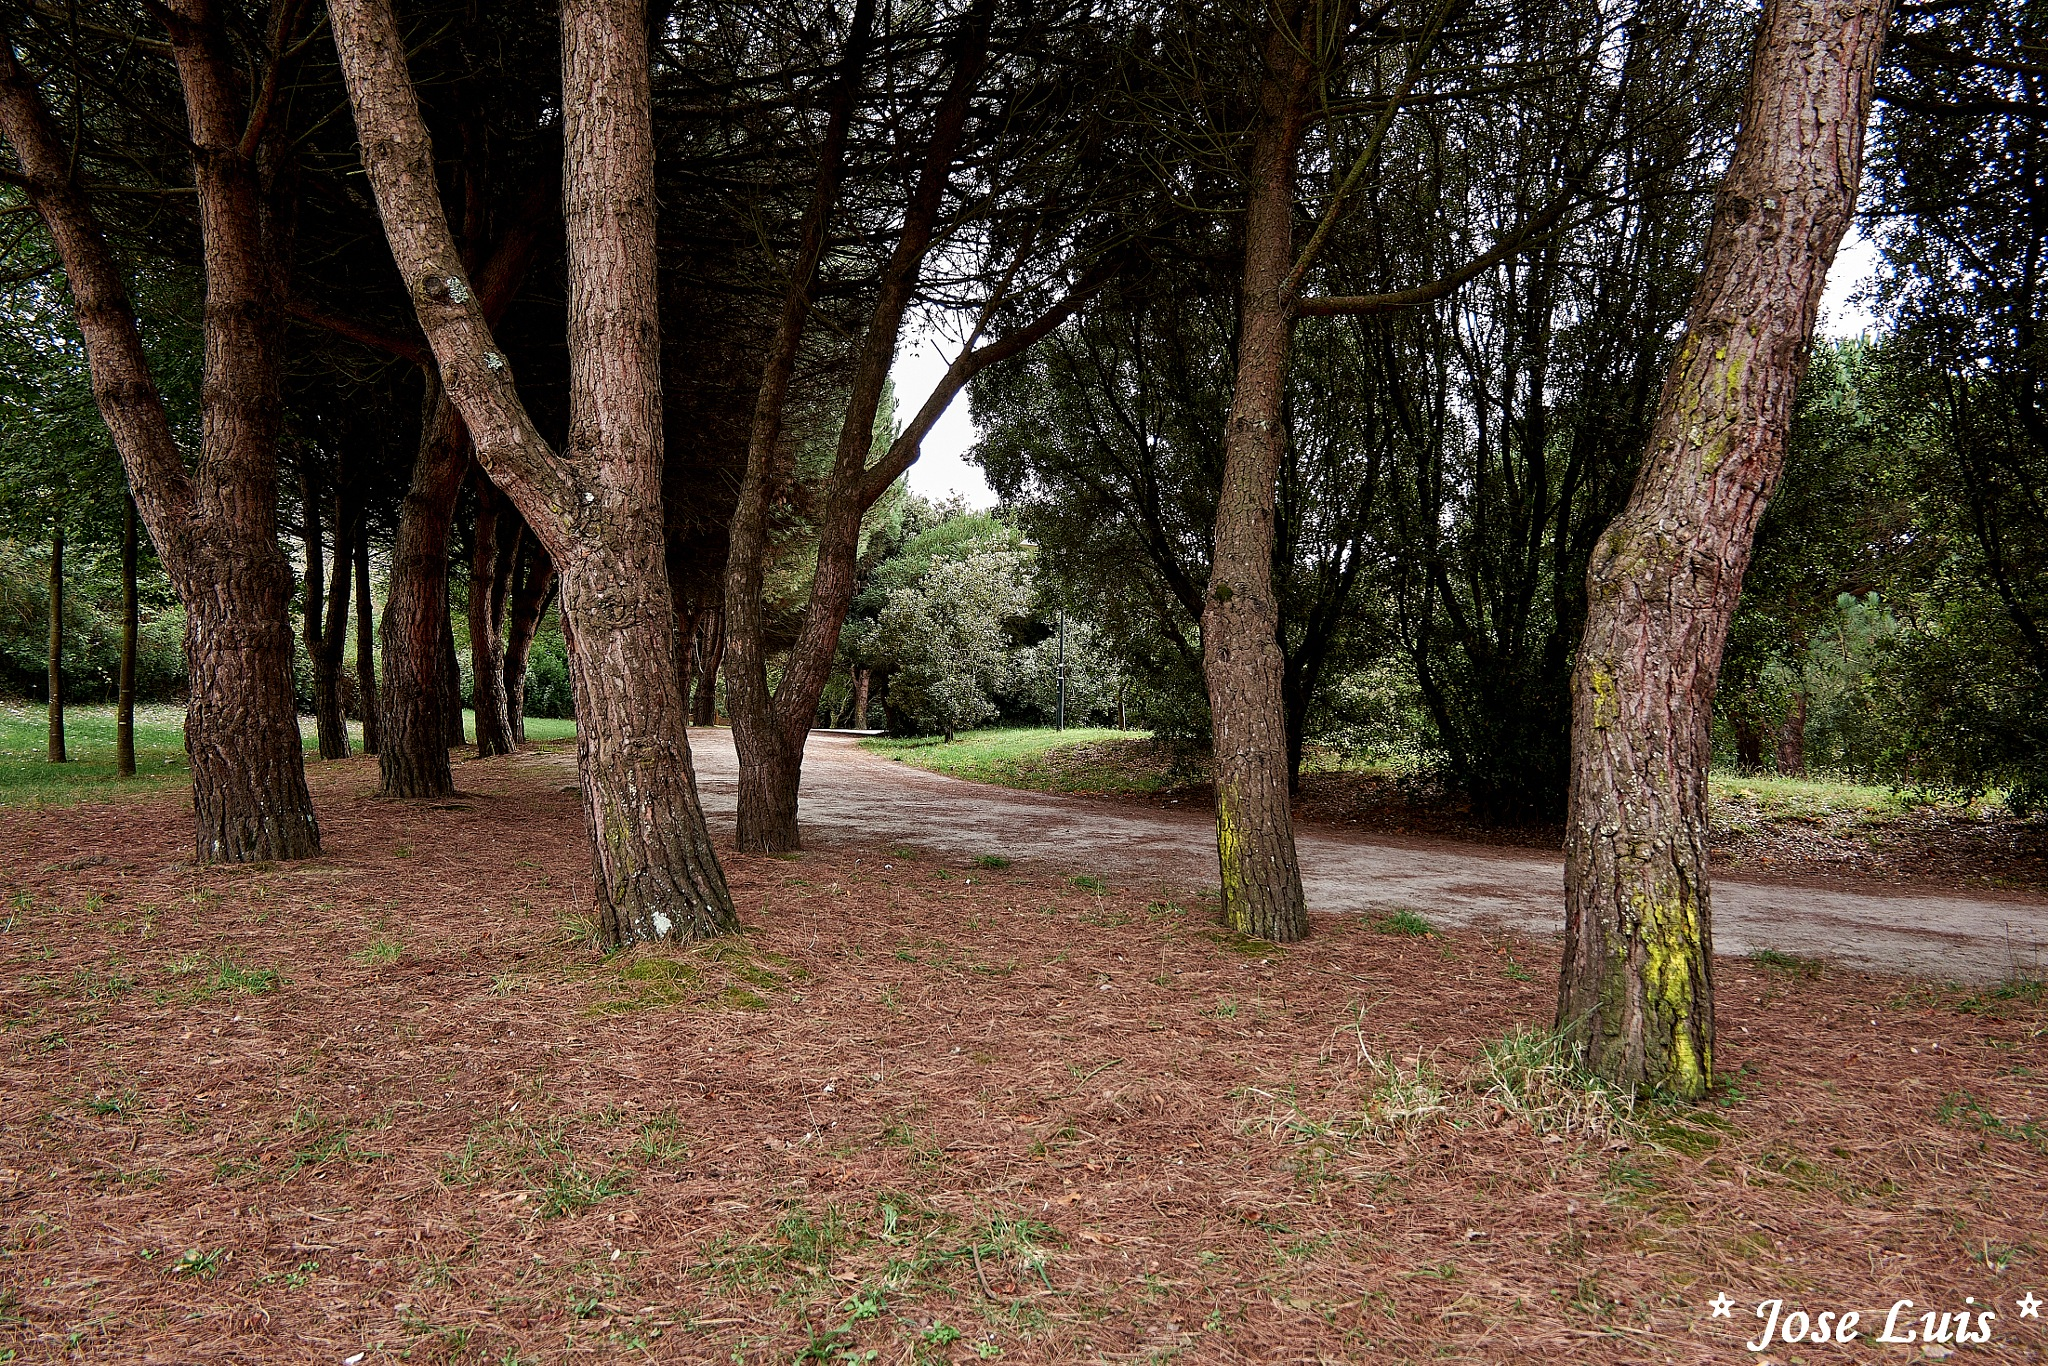 Parque da Cidade by jose.downlord